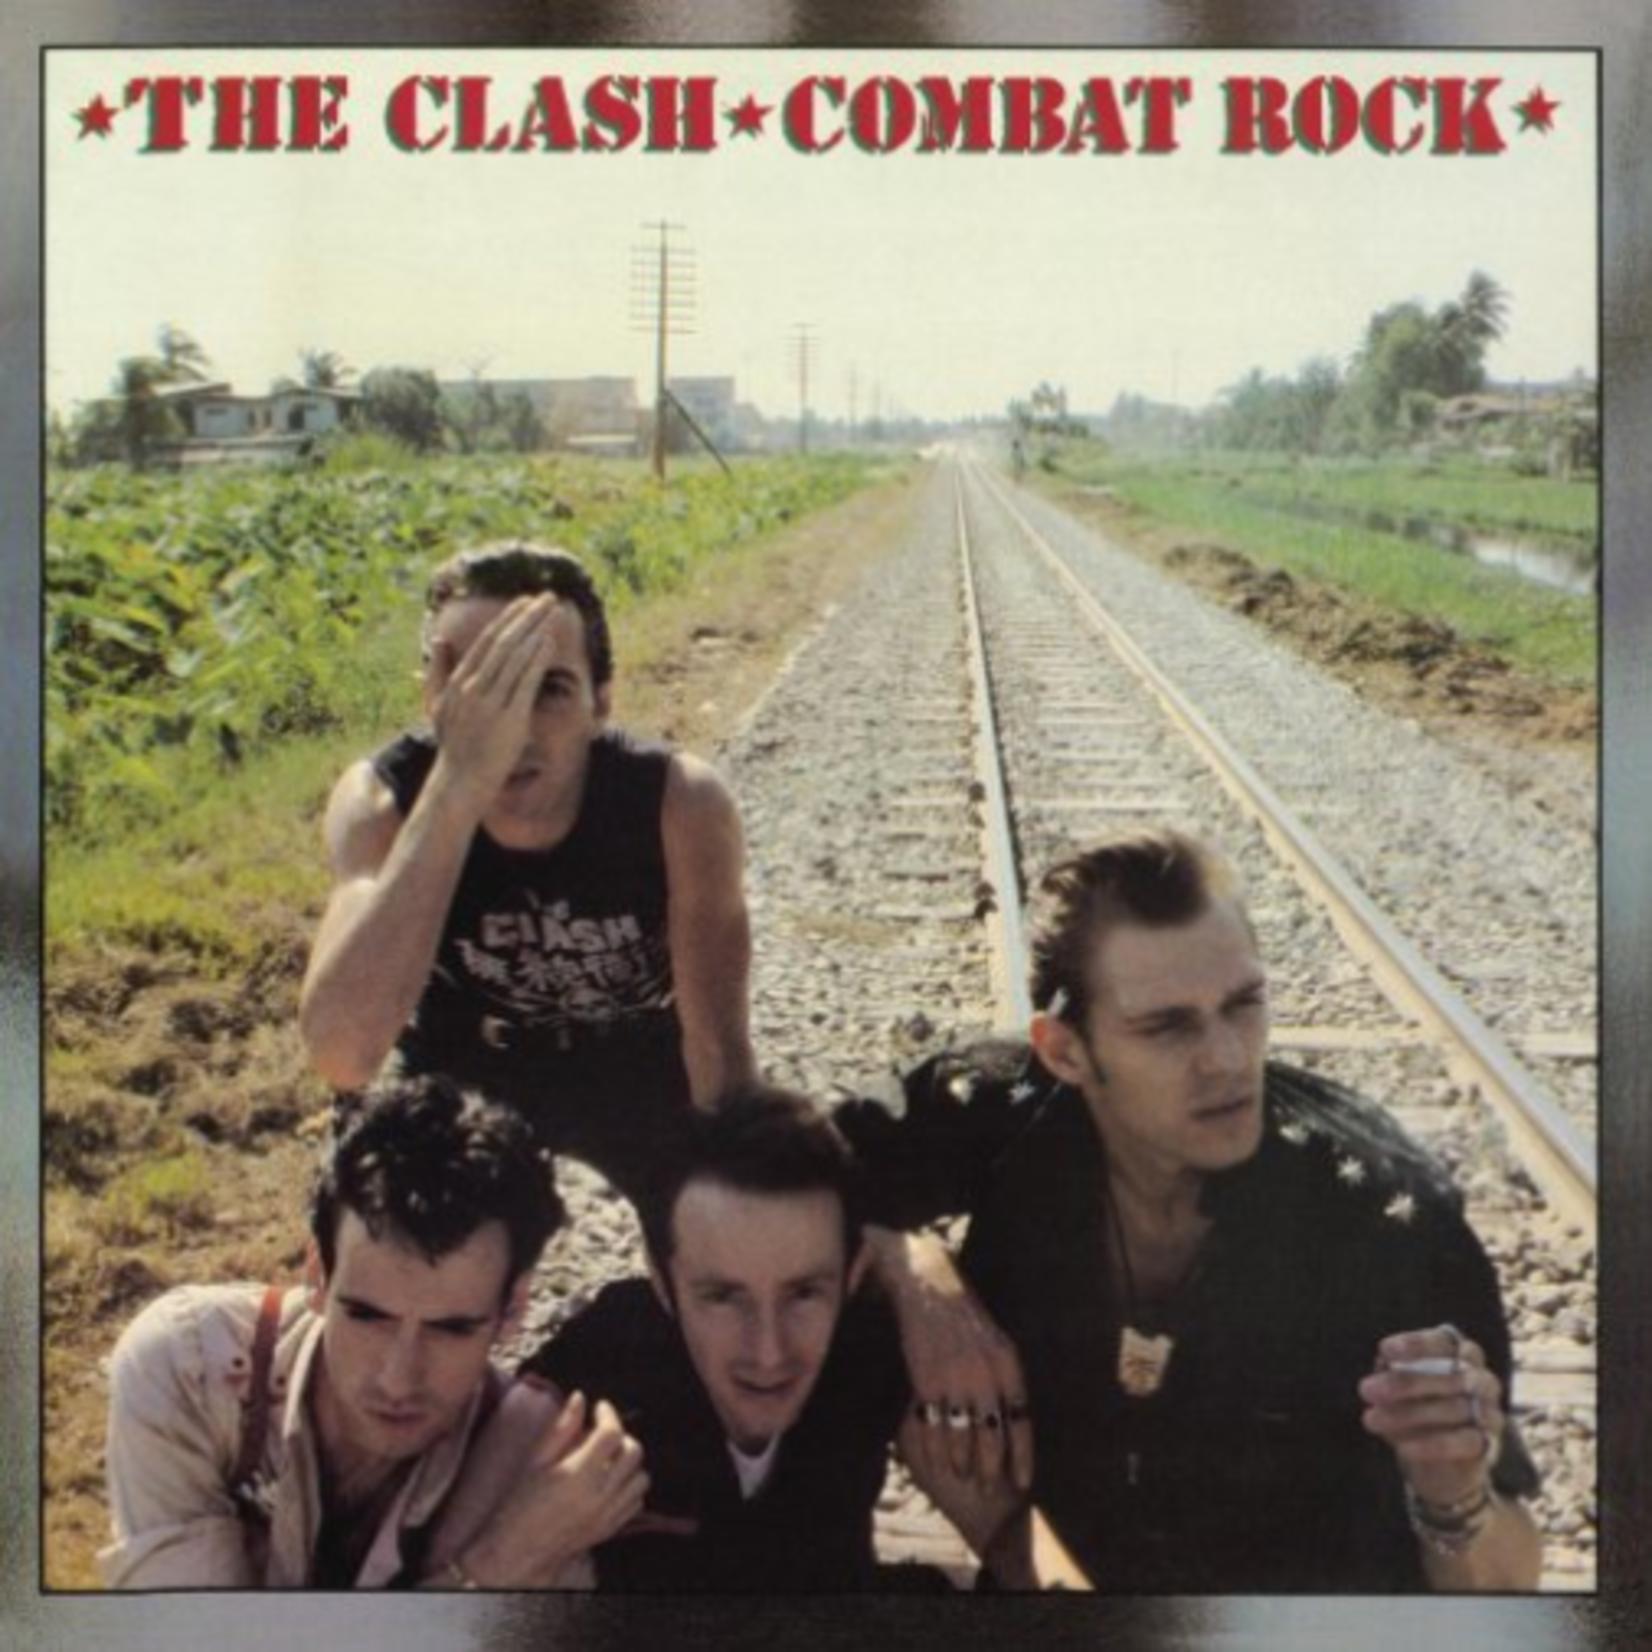 THE CLASH COMBAT ROCK (REMASTERED) LP